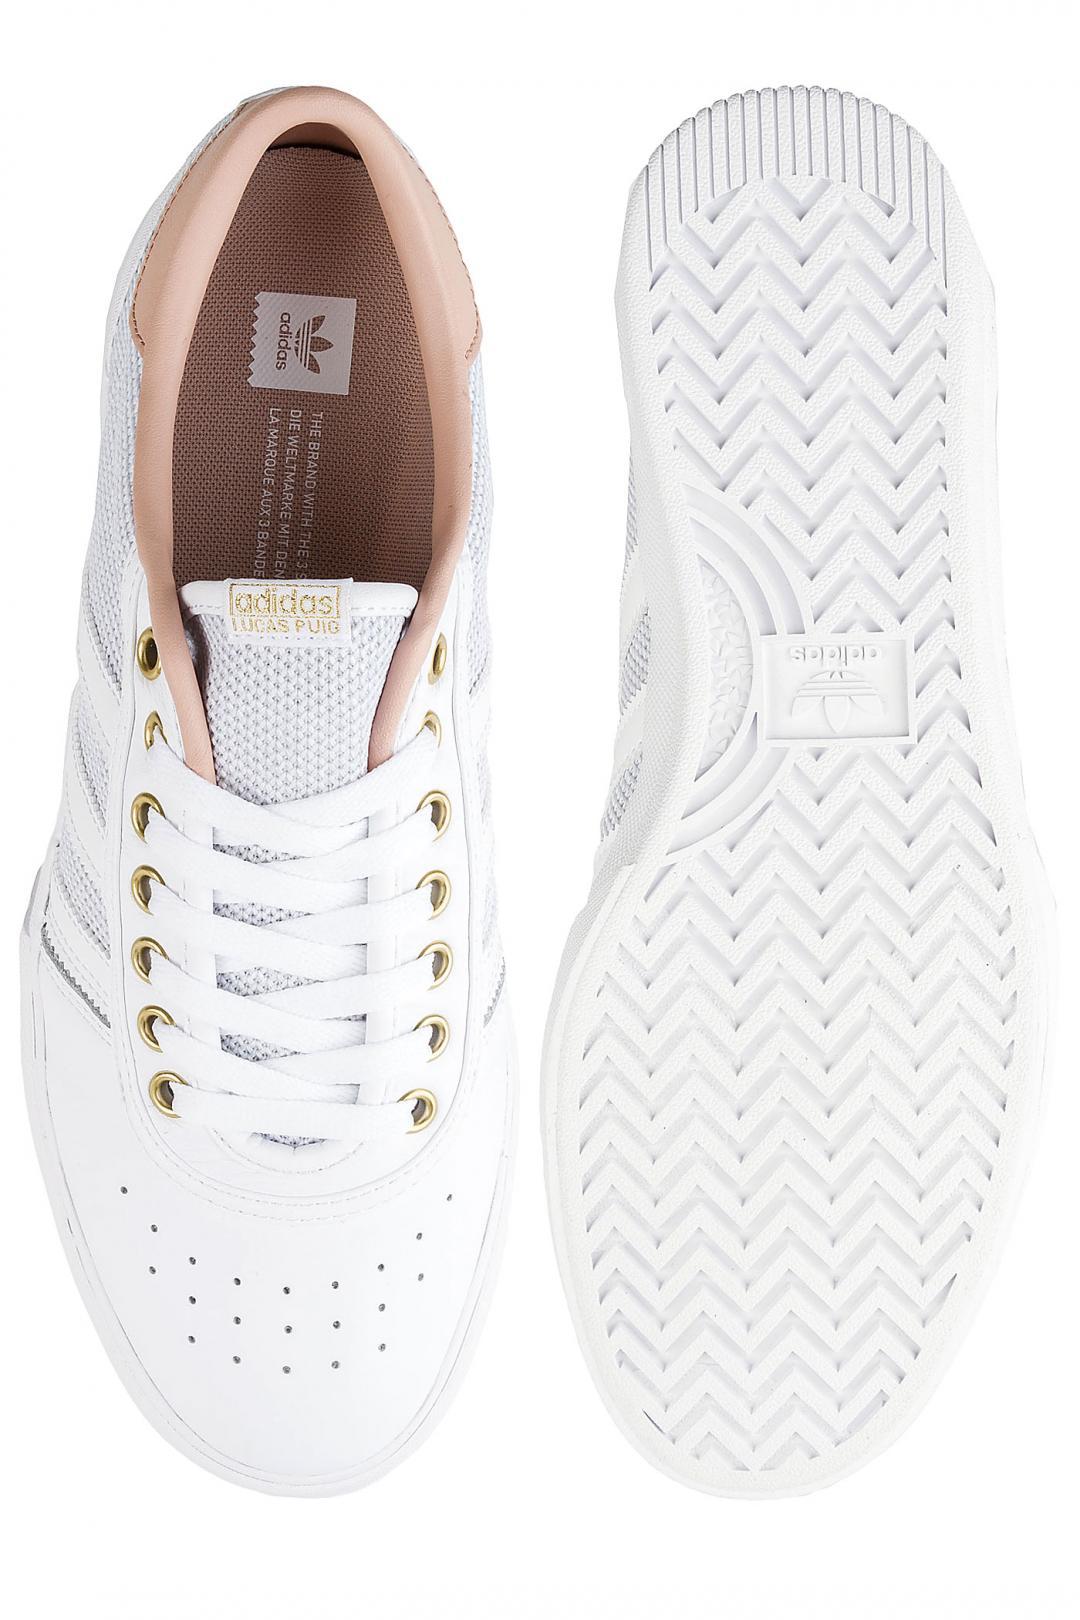 Uomo adidas Skateboarding Lucas Premiere white asphalt gold   Sneaker